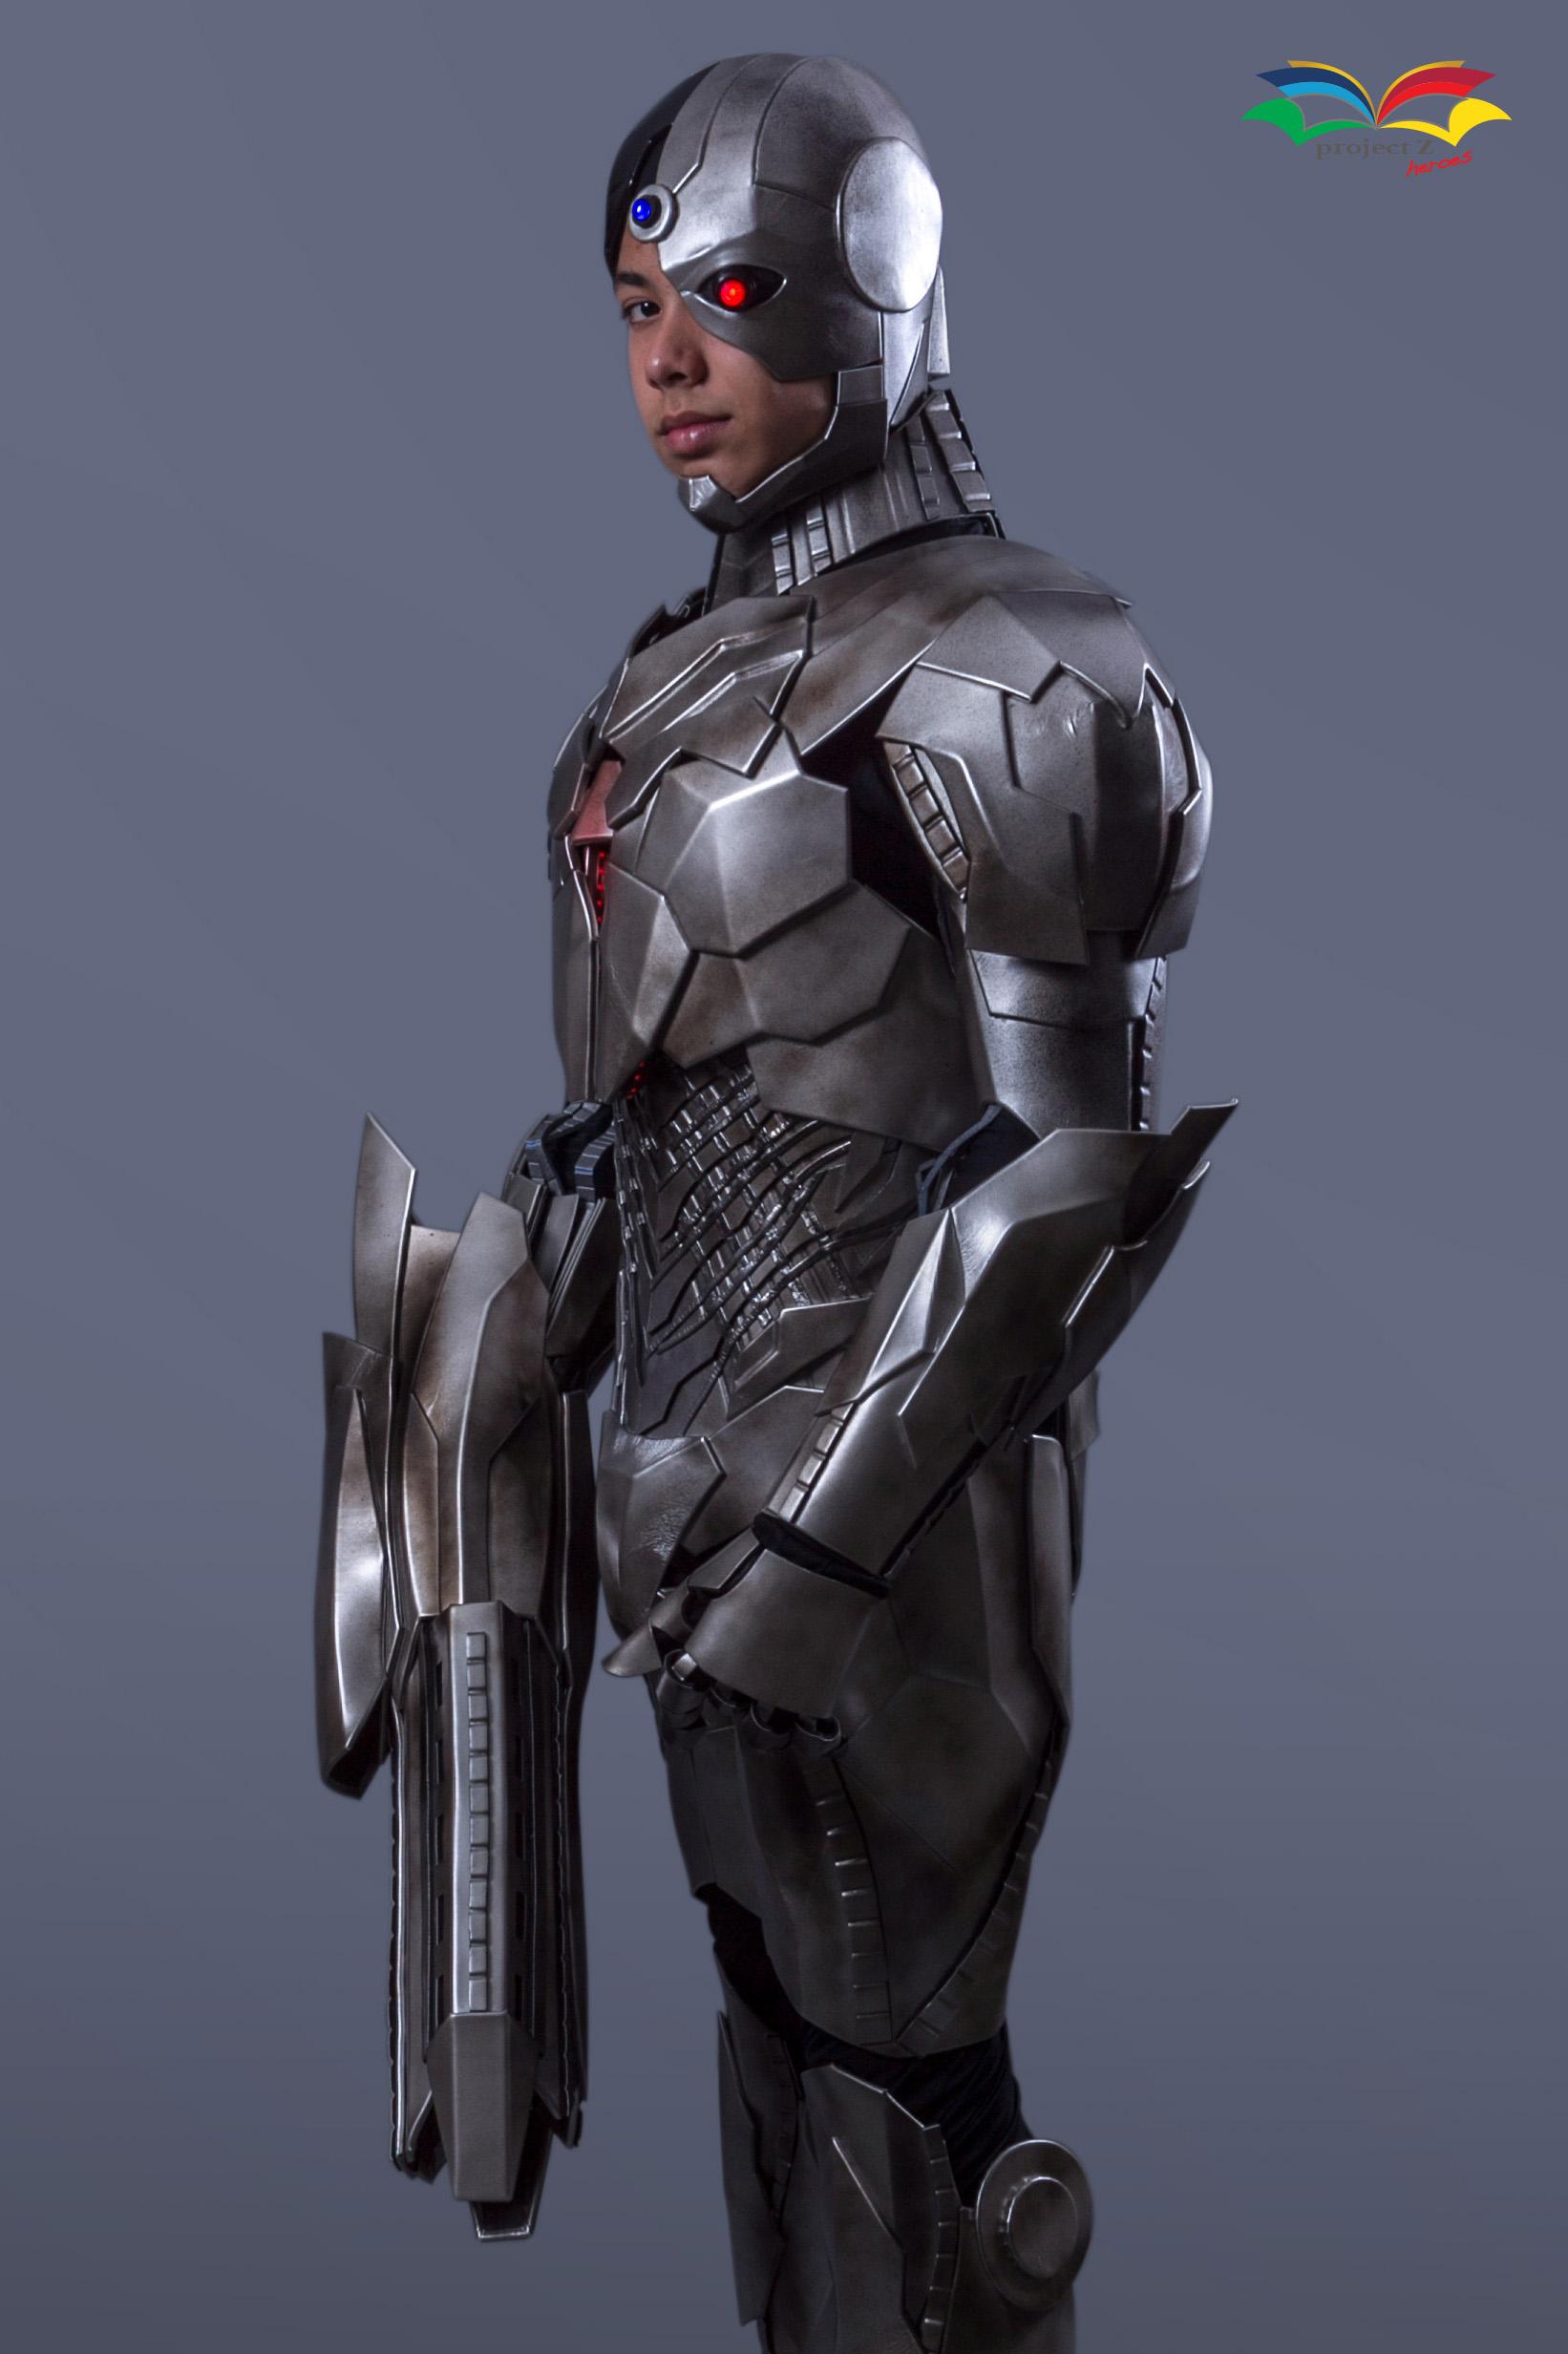 Cyborg costume sideway